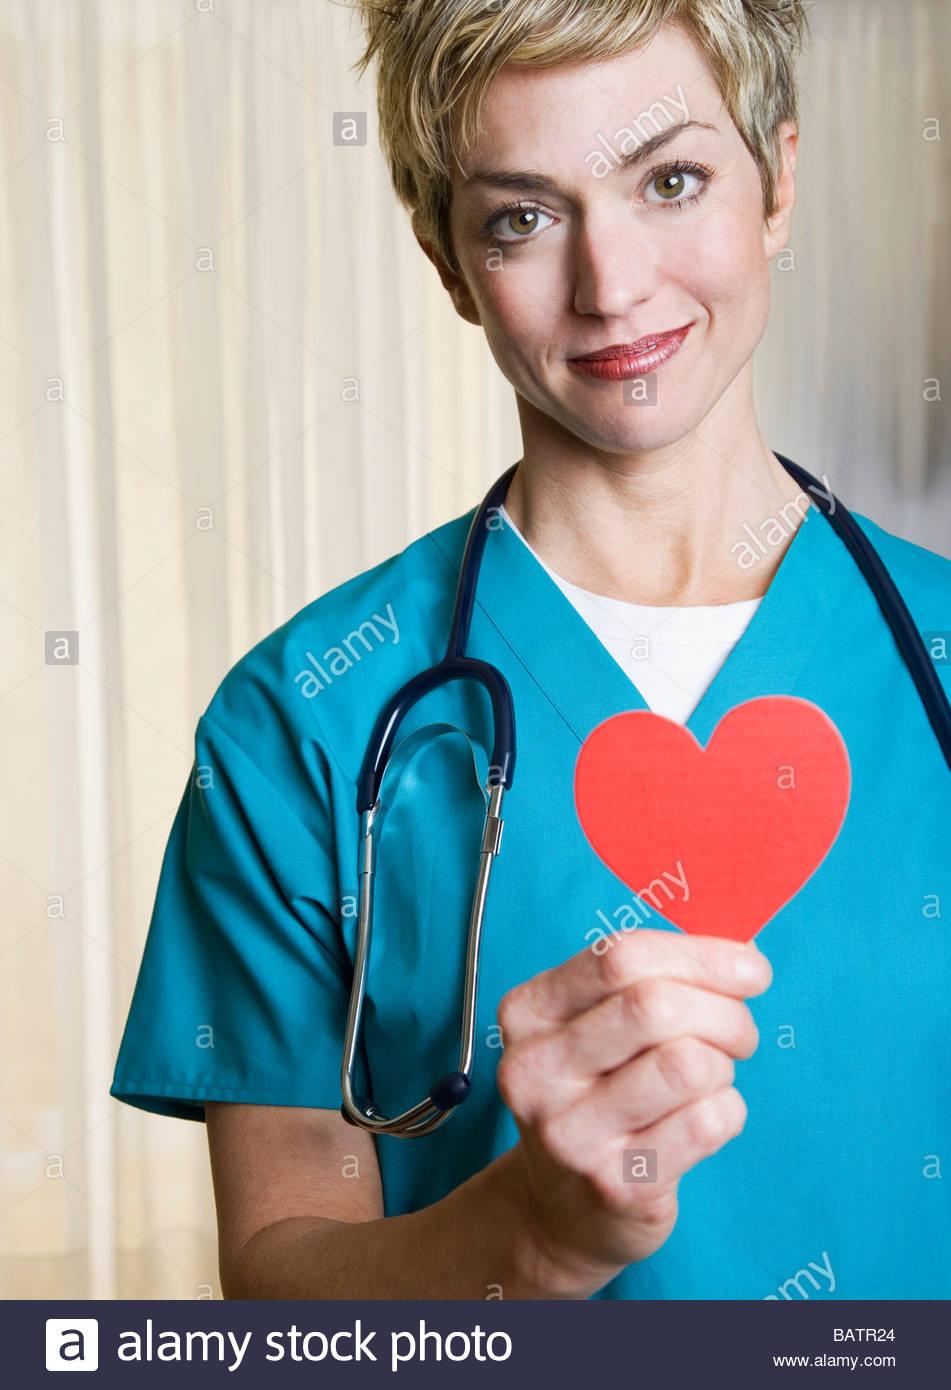 Female nurse holding heart-shaped cut out - Stock Image